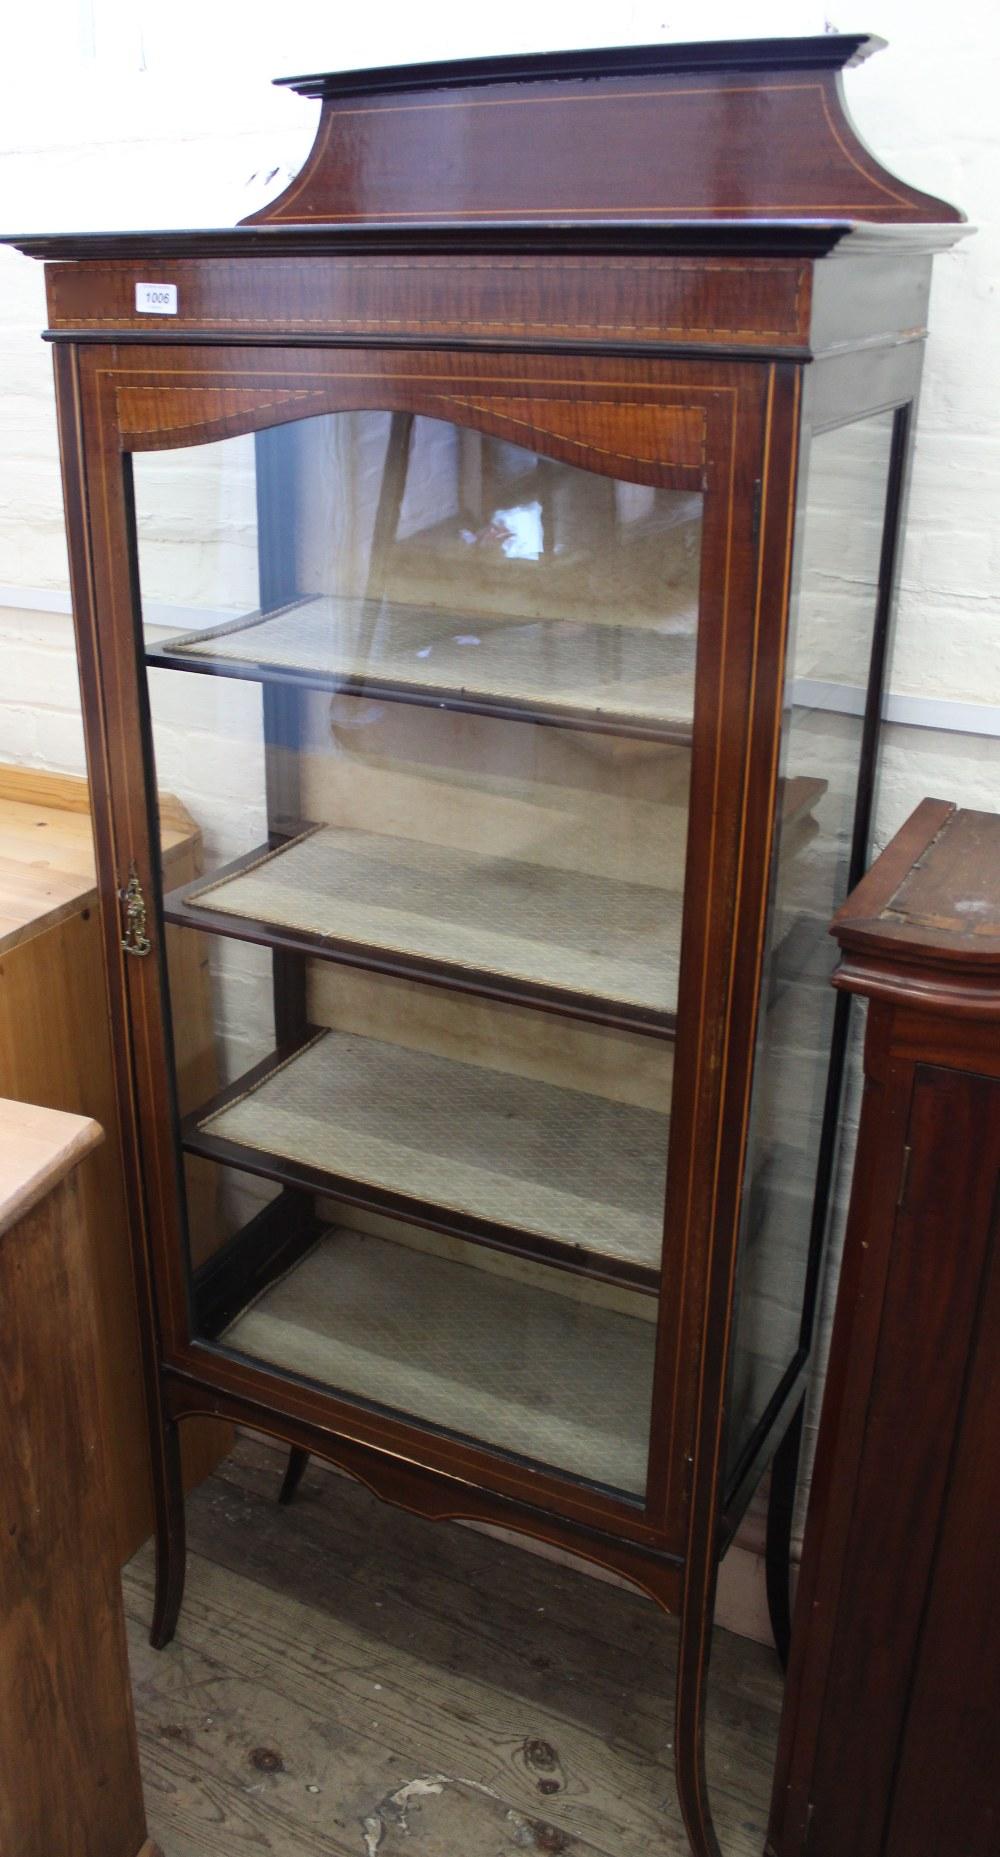 Lot 1006 - An Edwardian mahogany inlaid glazed display cabinet